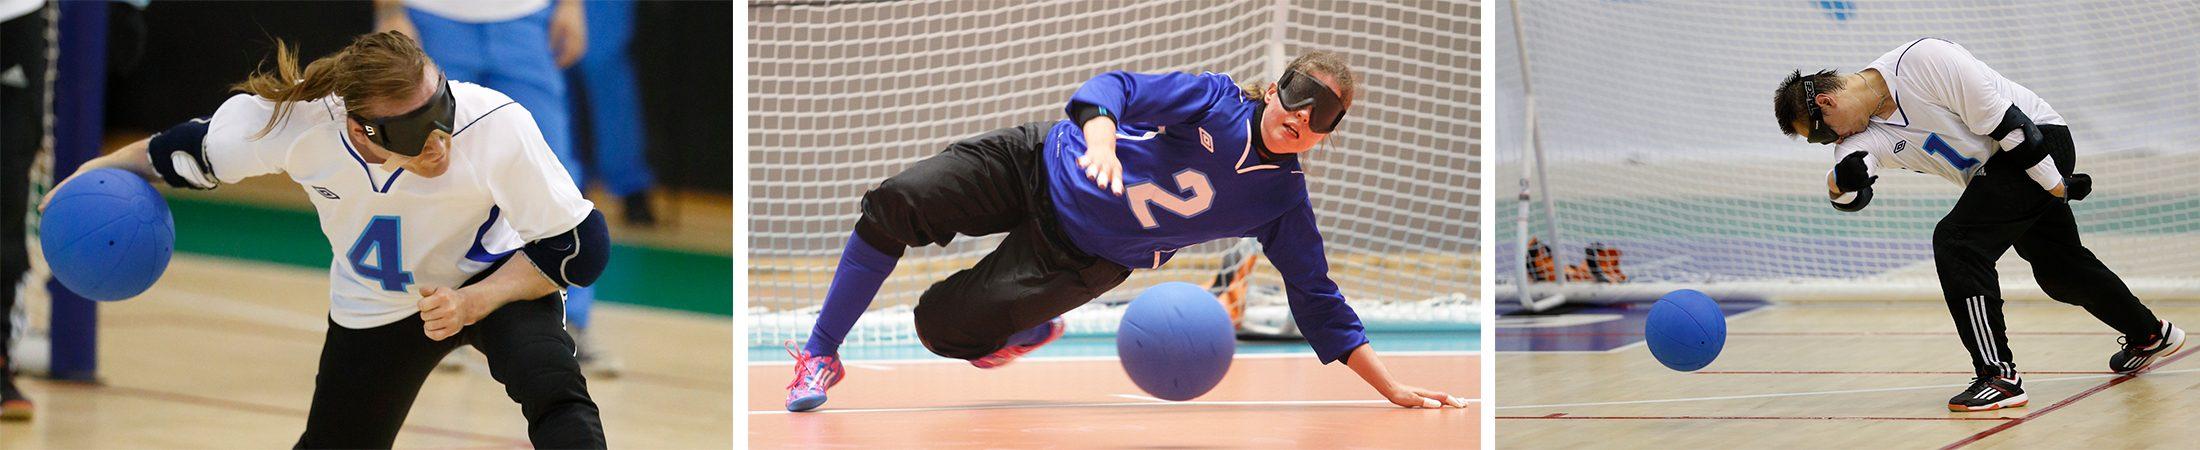 Goalball Finland